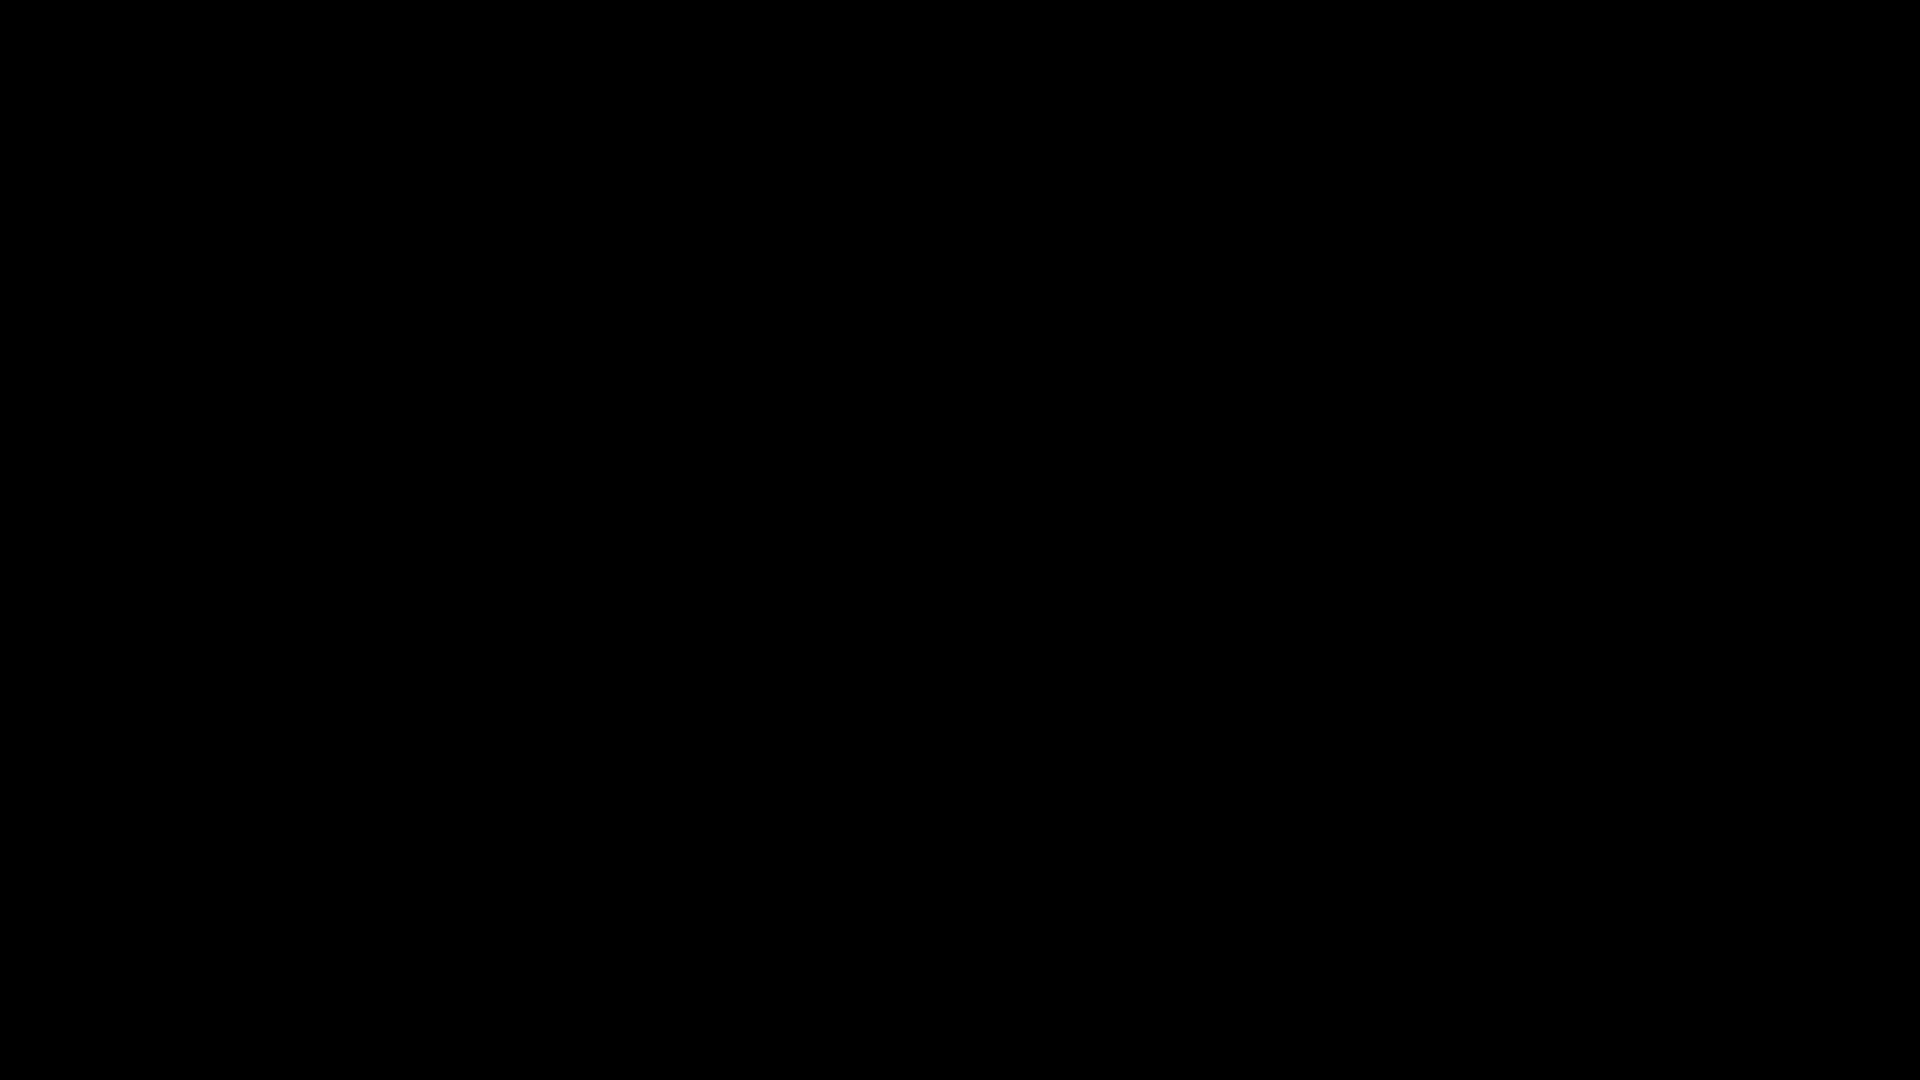 VIREI HOLOGRAMA! PROJETO COM METASTAGE